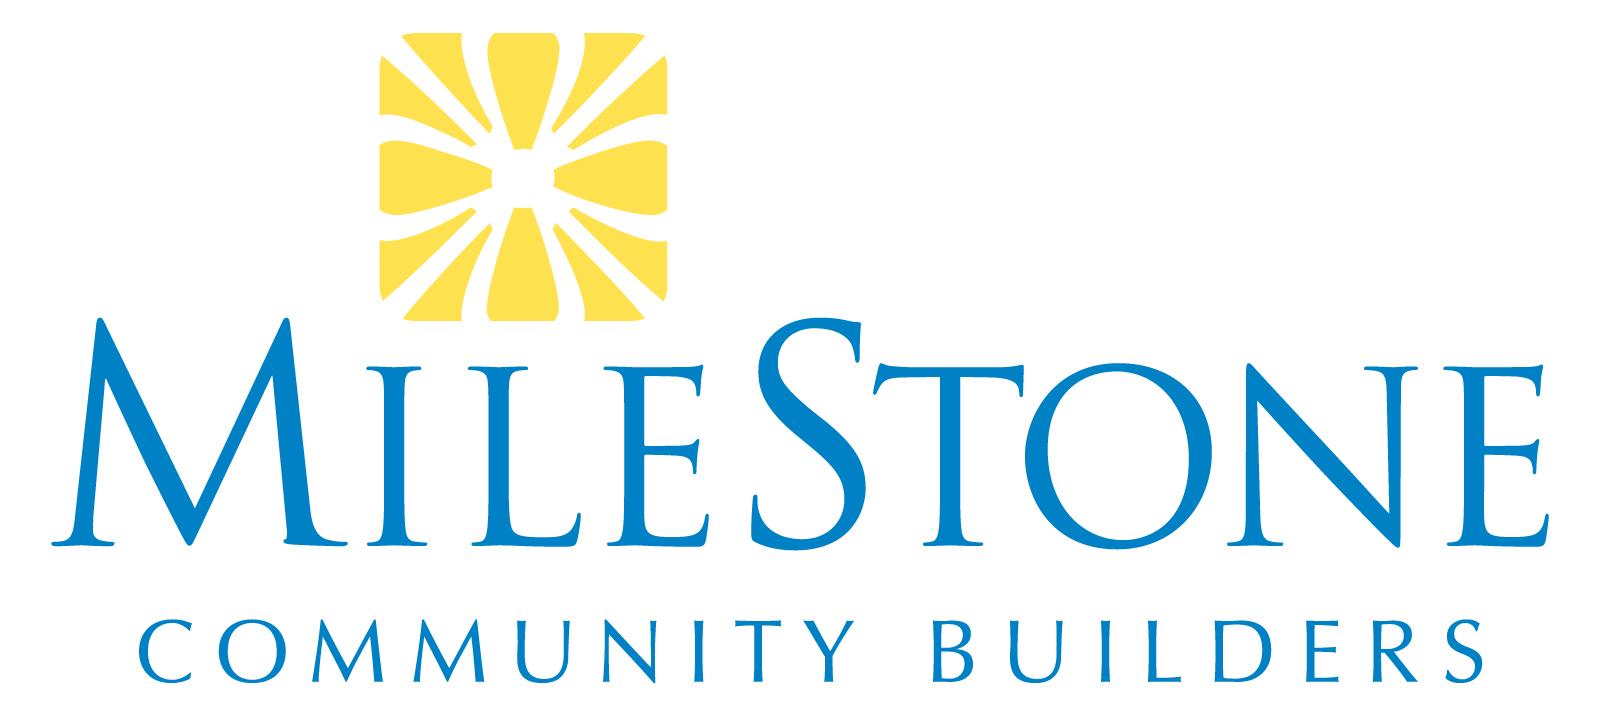 MileStone Communtiy Builders image